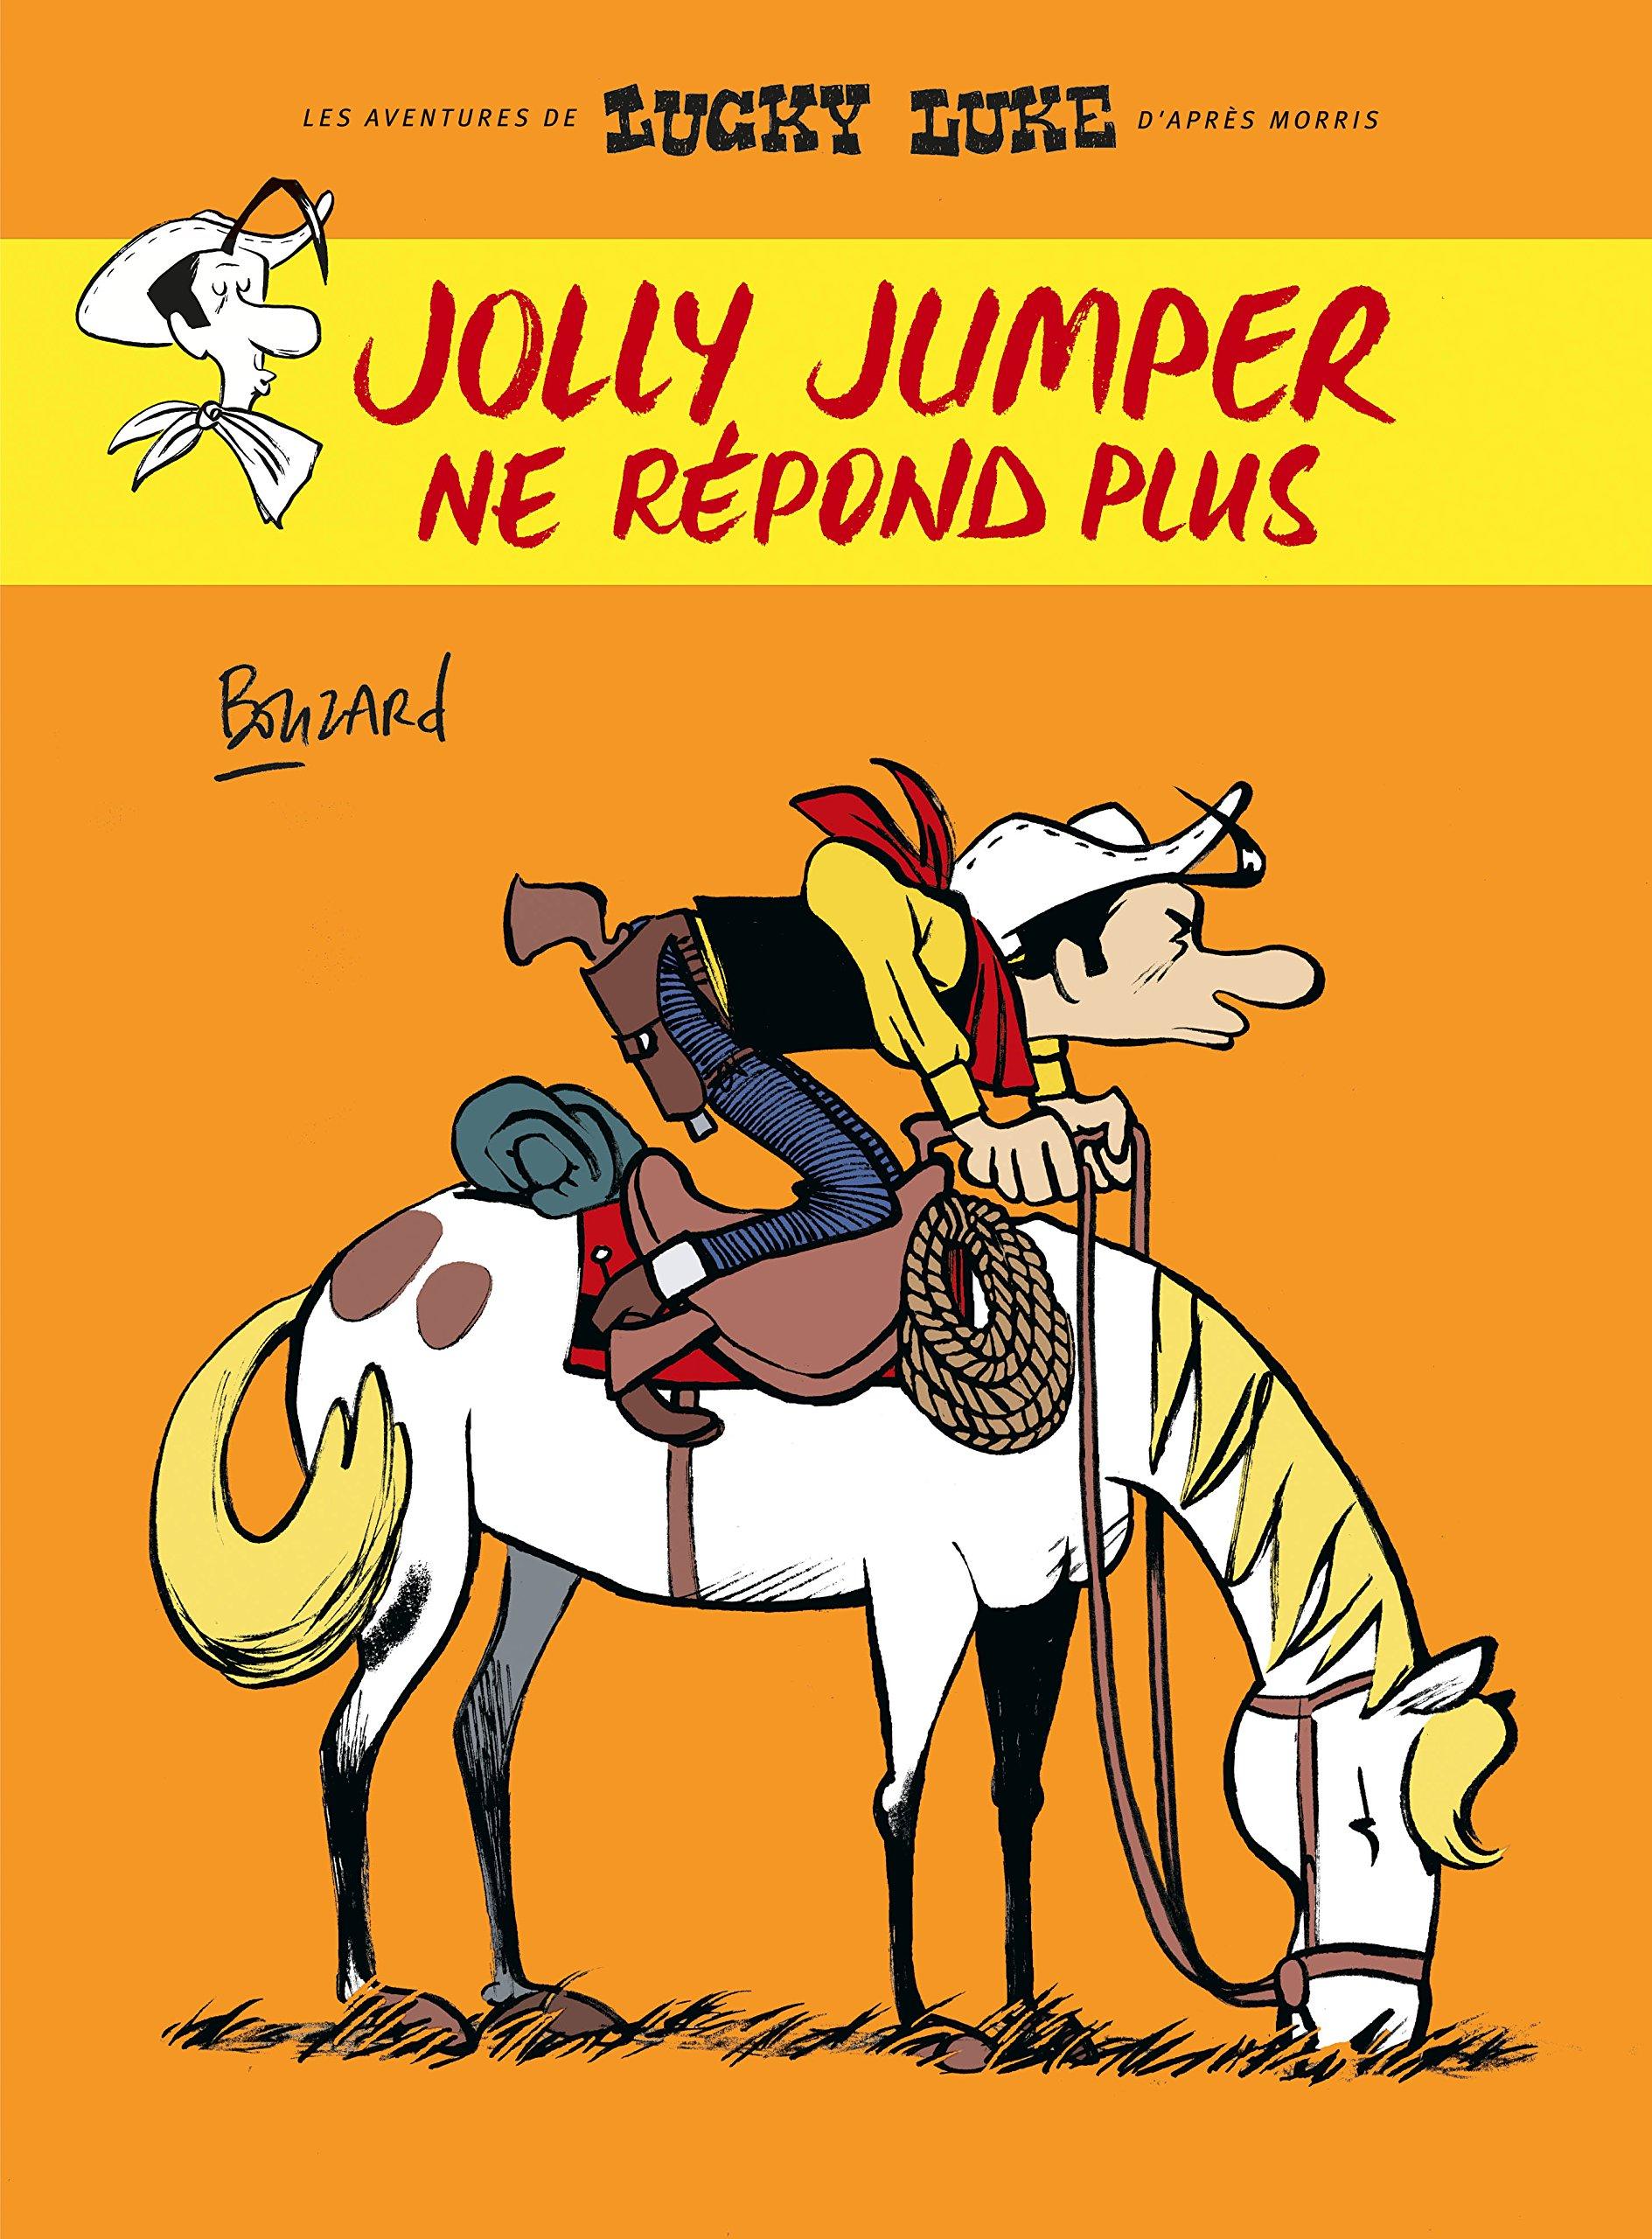 Les aventures de Lucky Luke 2 - Jolly Jumper ne répond plus